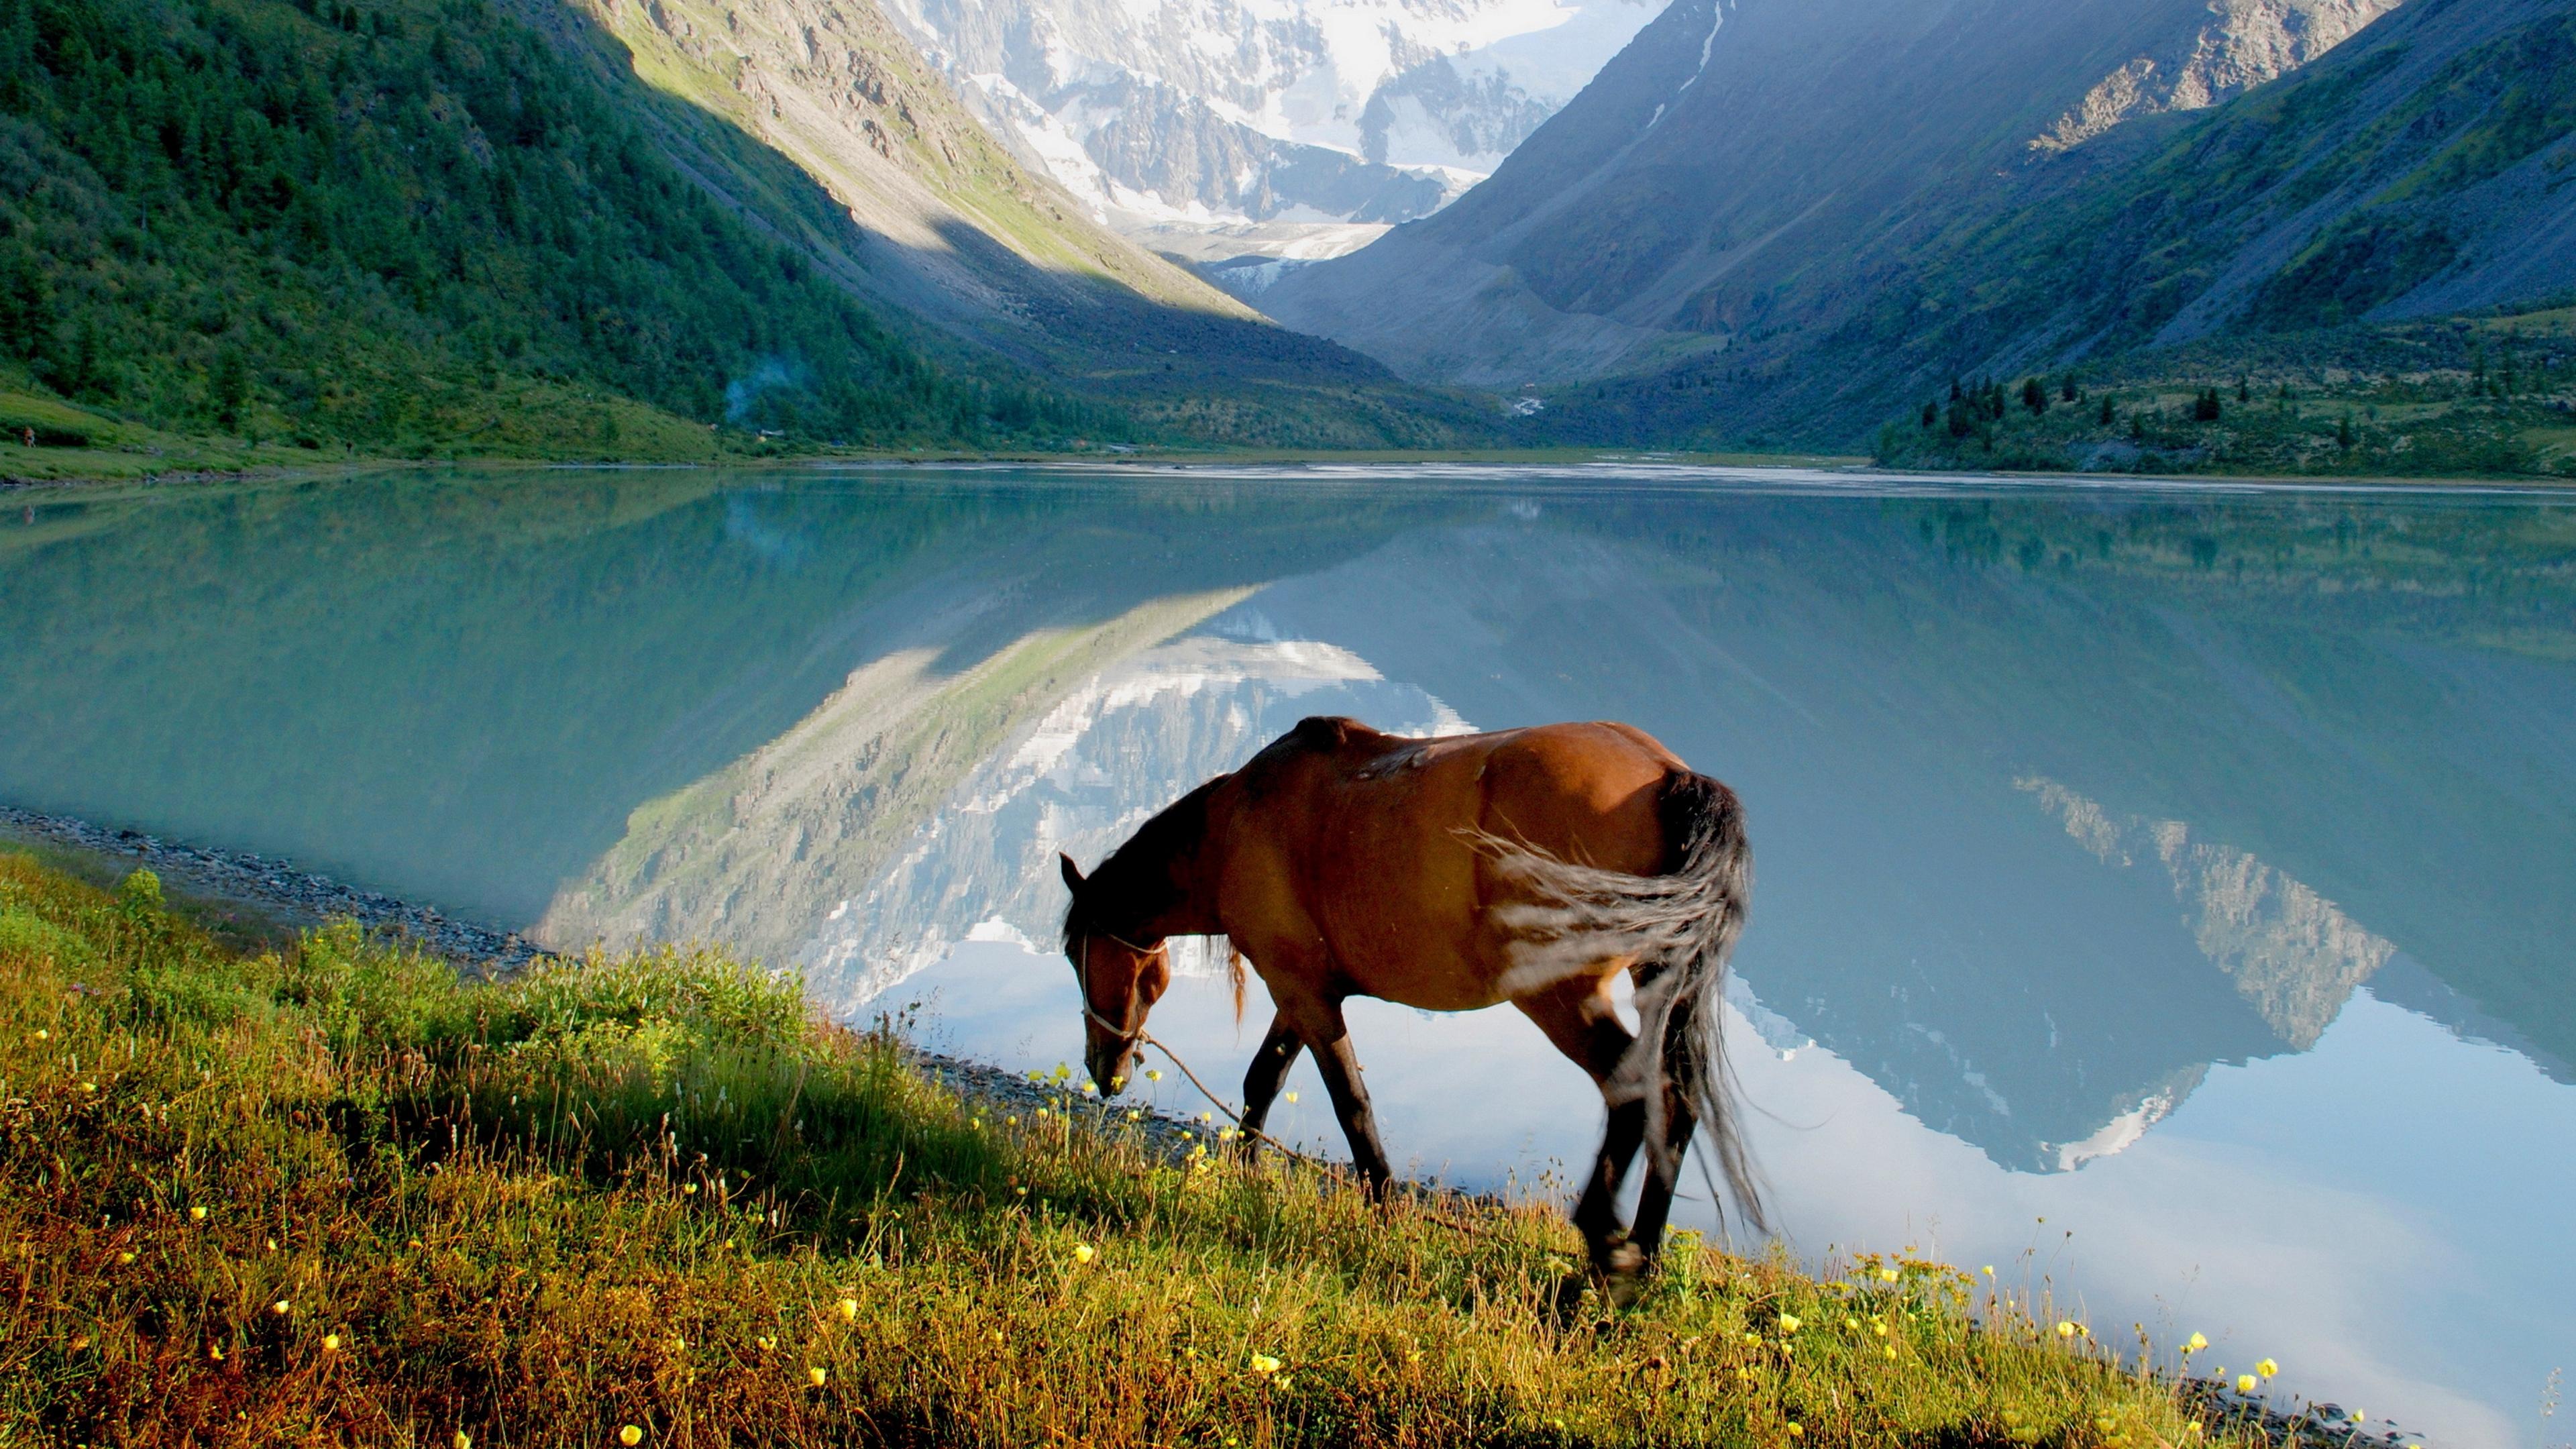 horse mountain lake grass walk 4k 1542242813 - horse, mountain, lake, grass, walk 4k - Mountain, Lake, horse